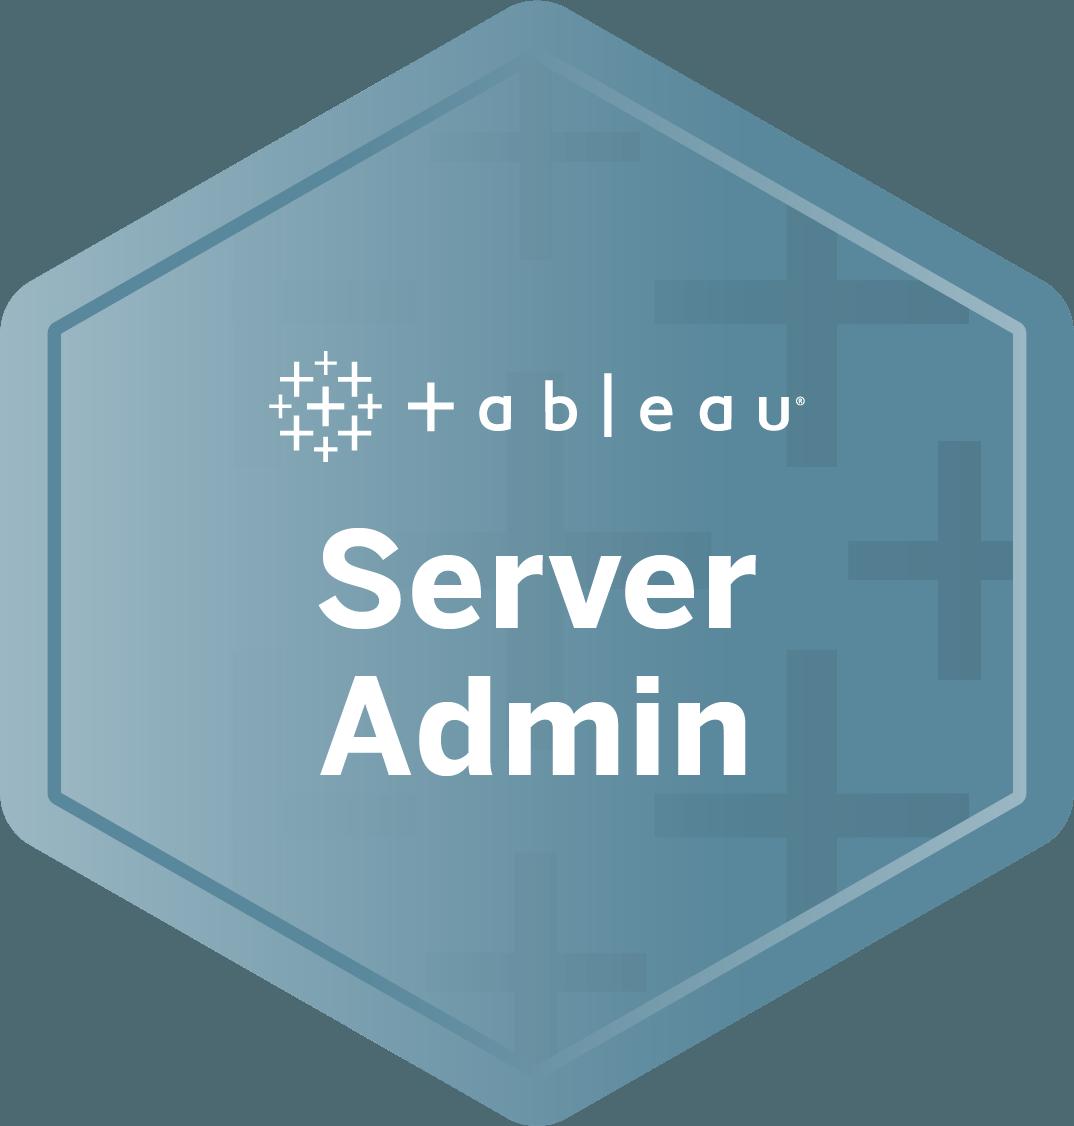 Server Admin badge